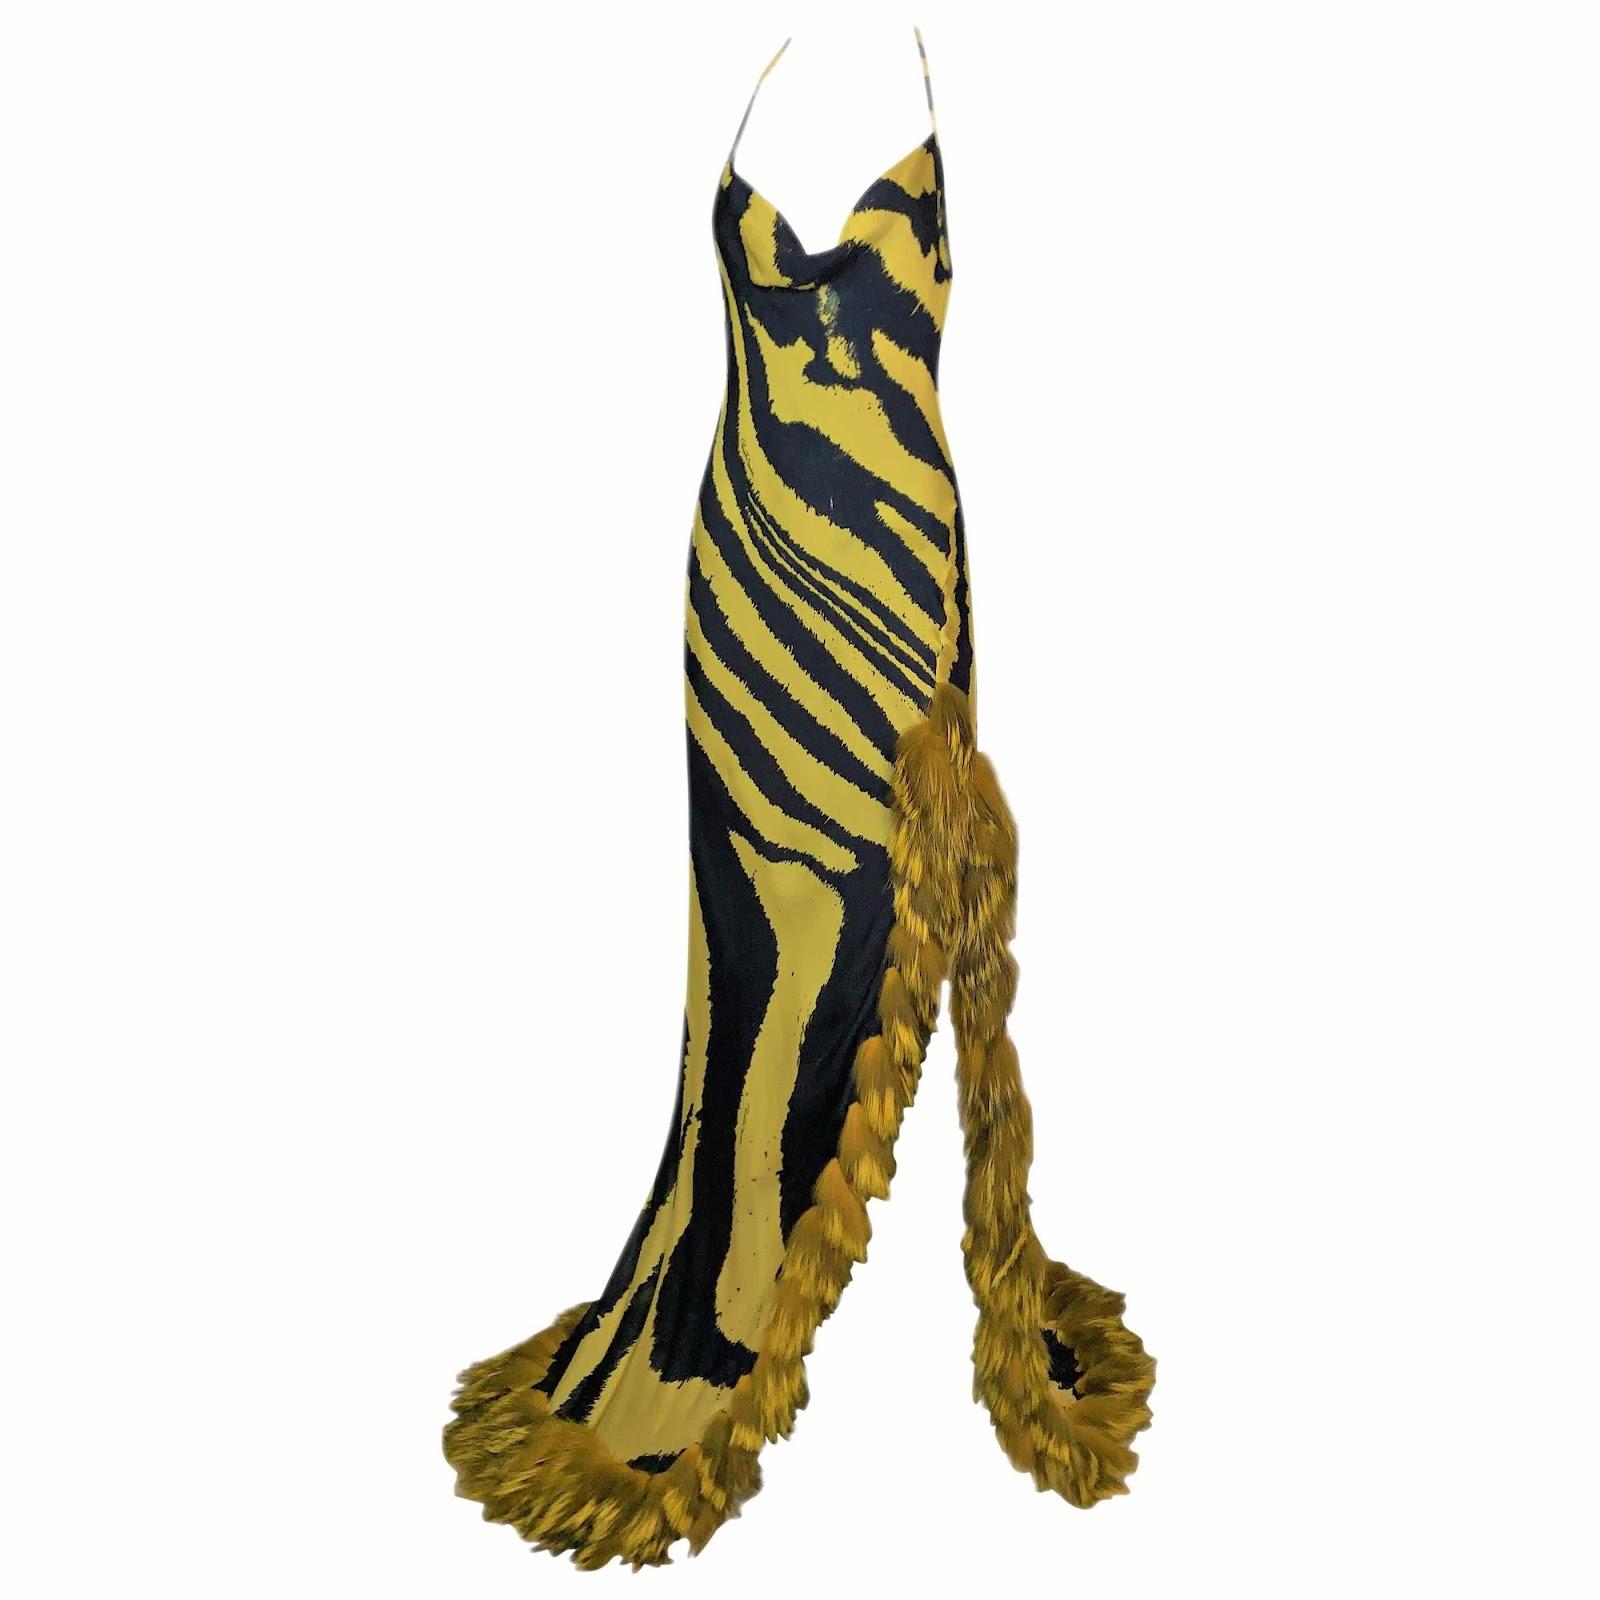 F/W 2000 Roberto Cavalli Runway Aaliyah Yellow Black Zebra Gown Dress